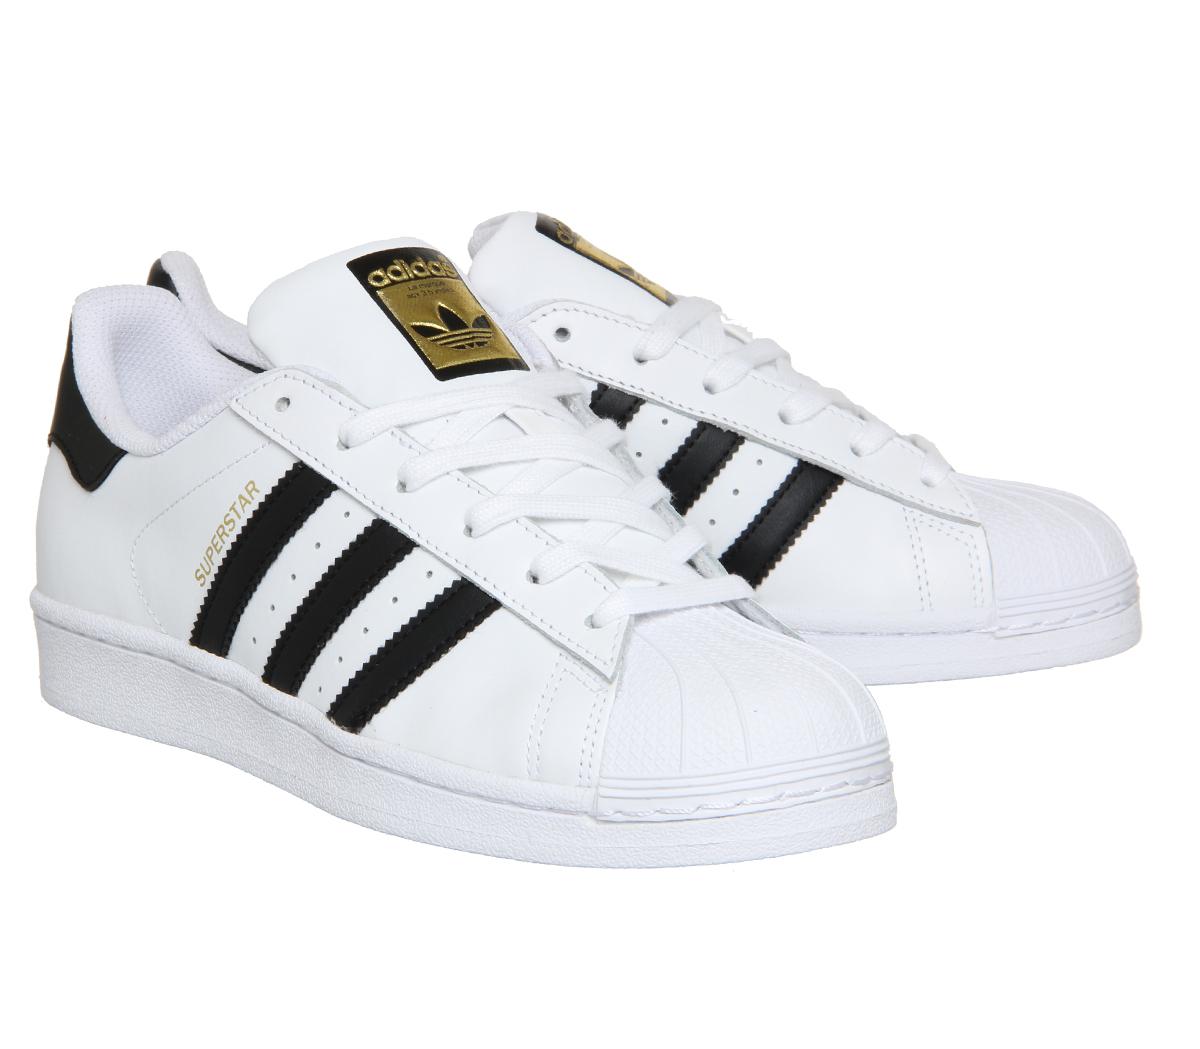 Adidas Superstar  Grade School Shoes